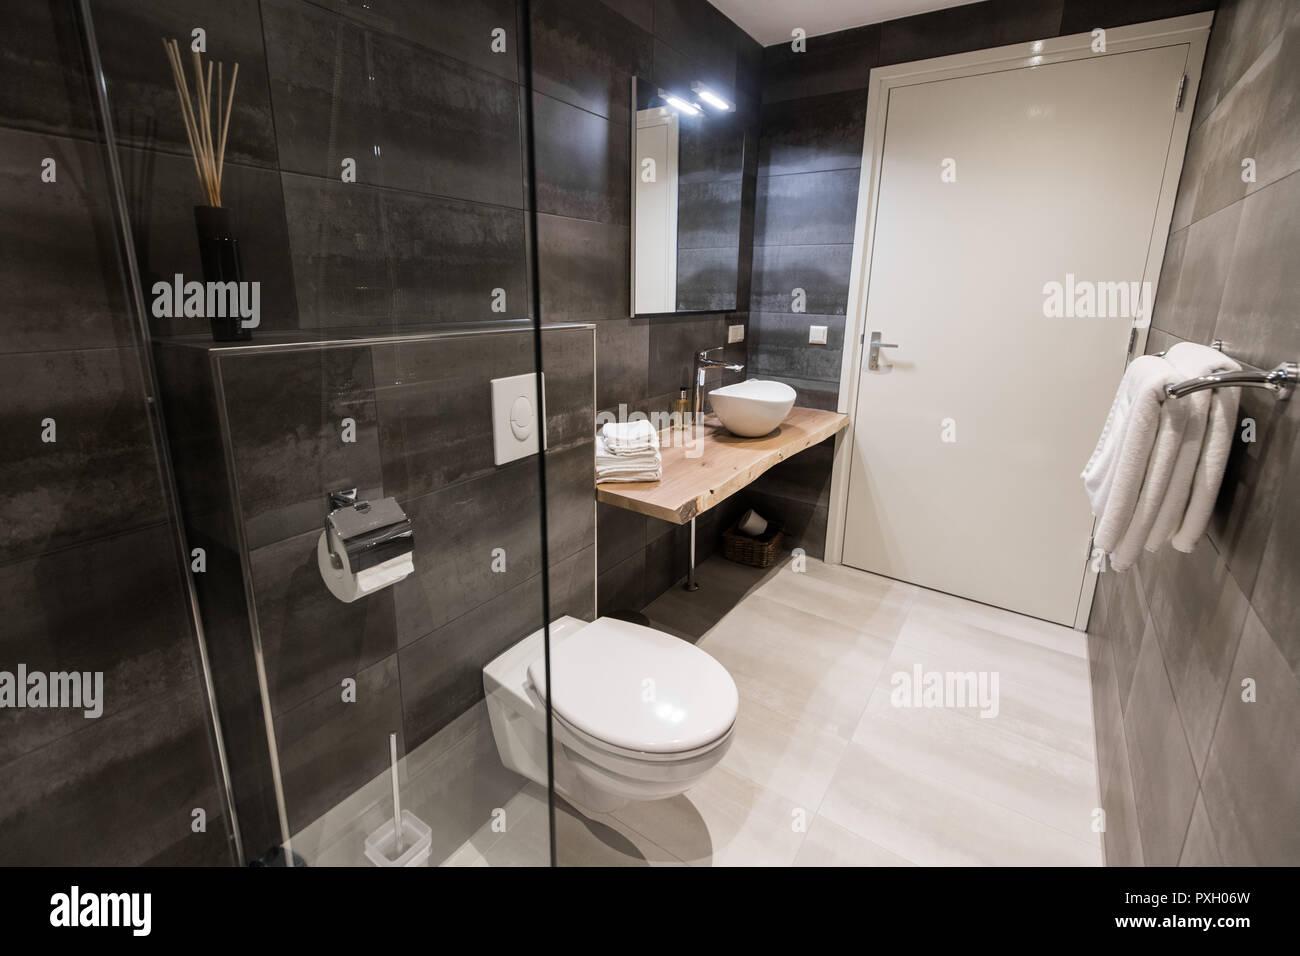 Modern Bathroom With A Shower Area And Bath Tub Including A Wall